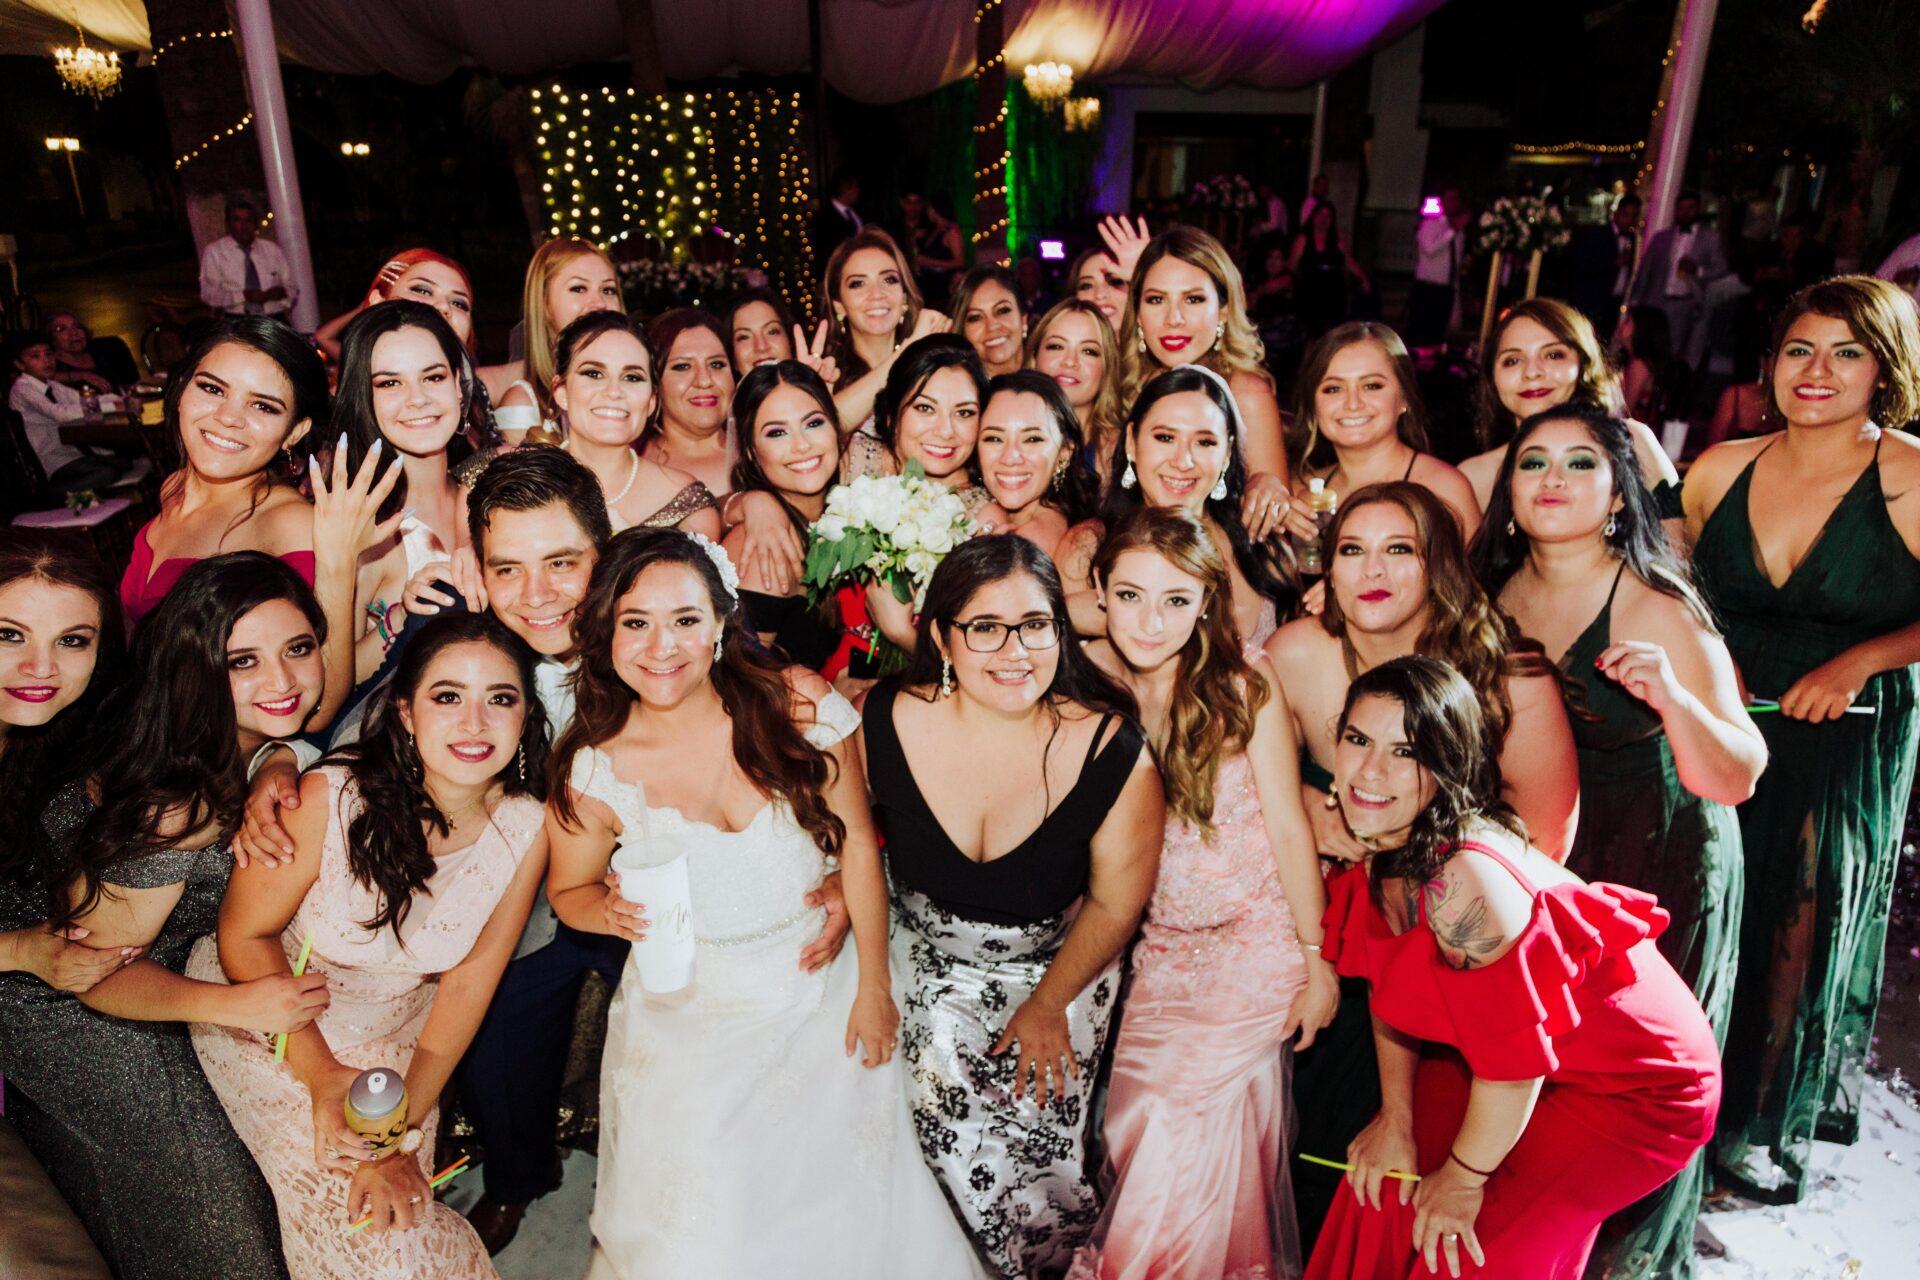 javier_noriega_fotografo_bodas_torreon_coahuila_zacatecas_wedding_photographer66a